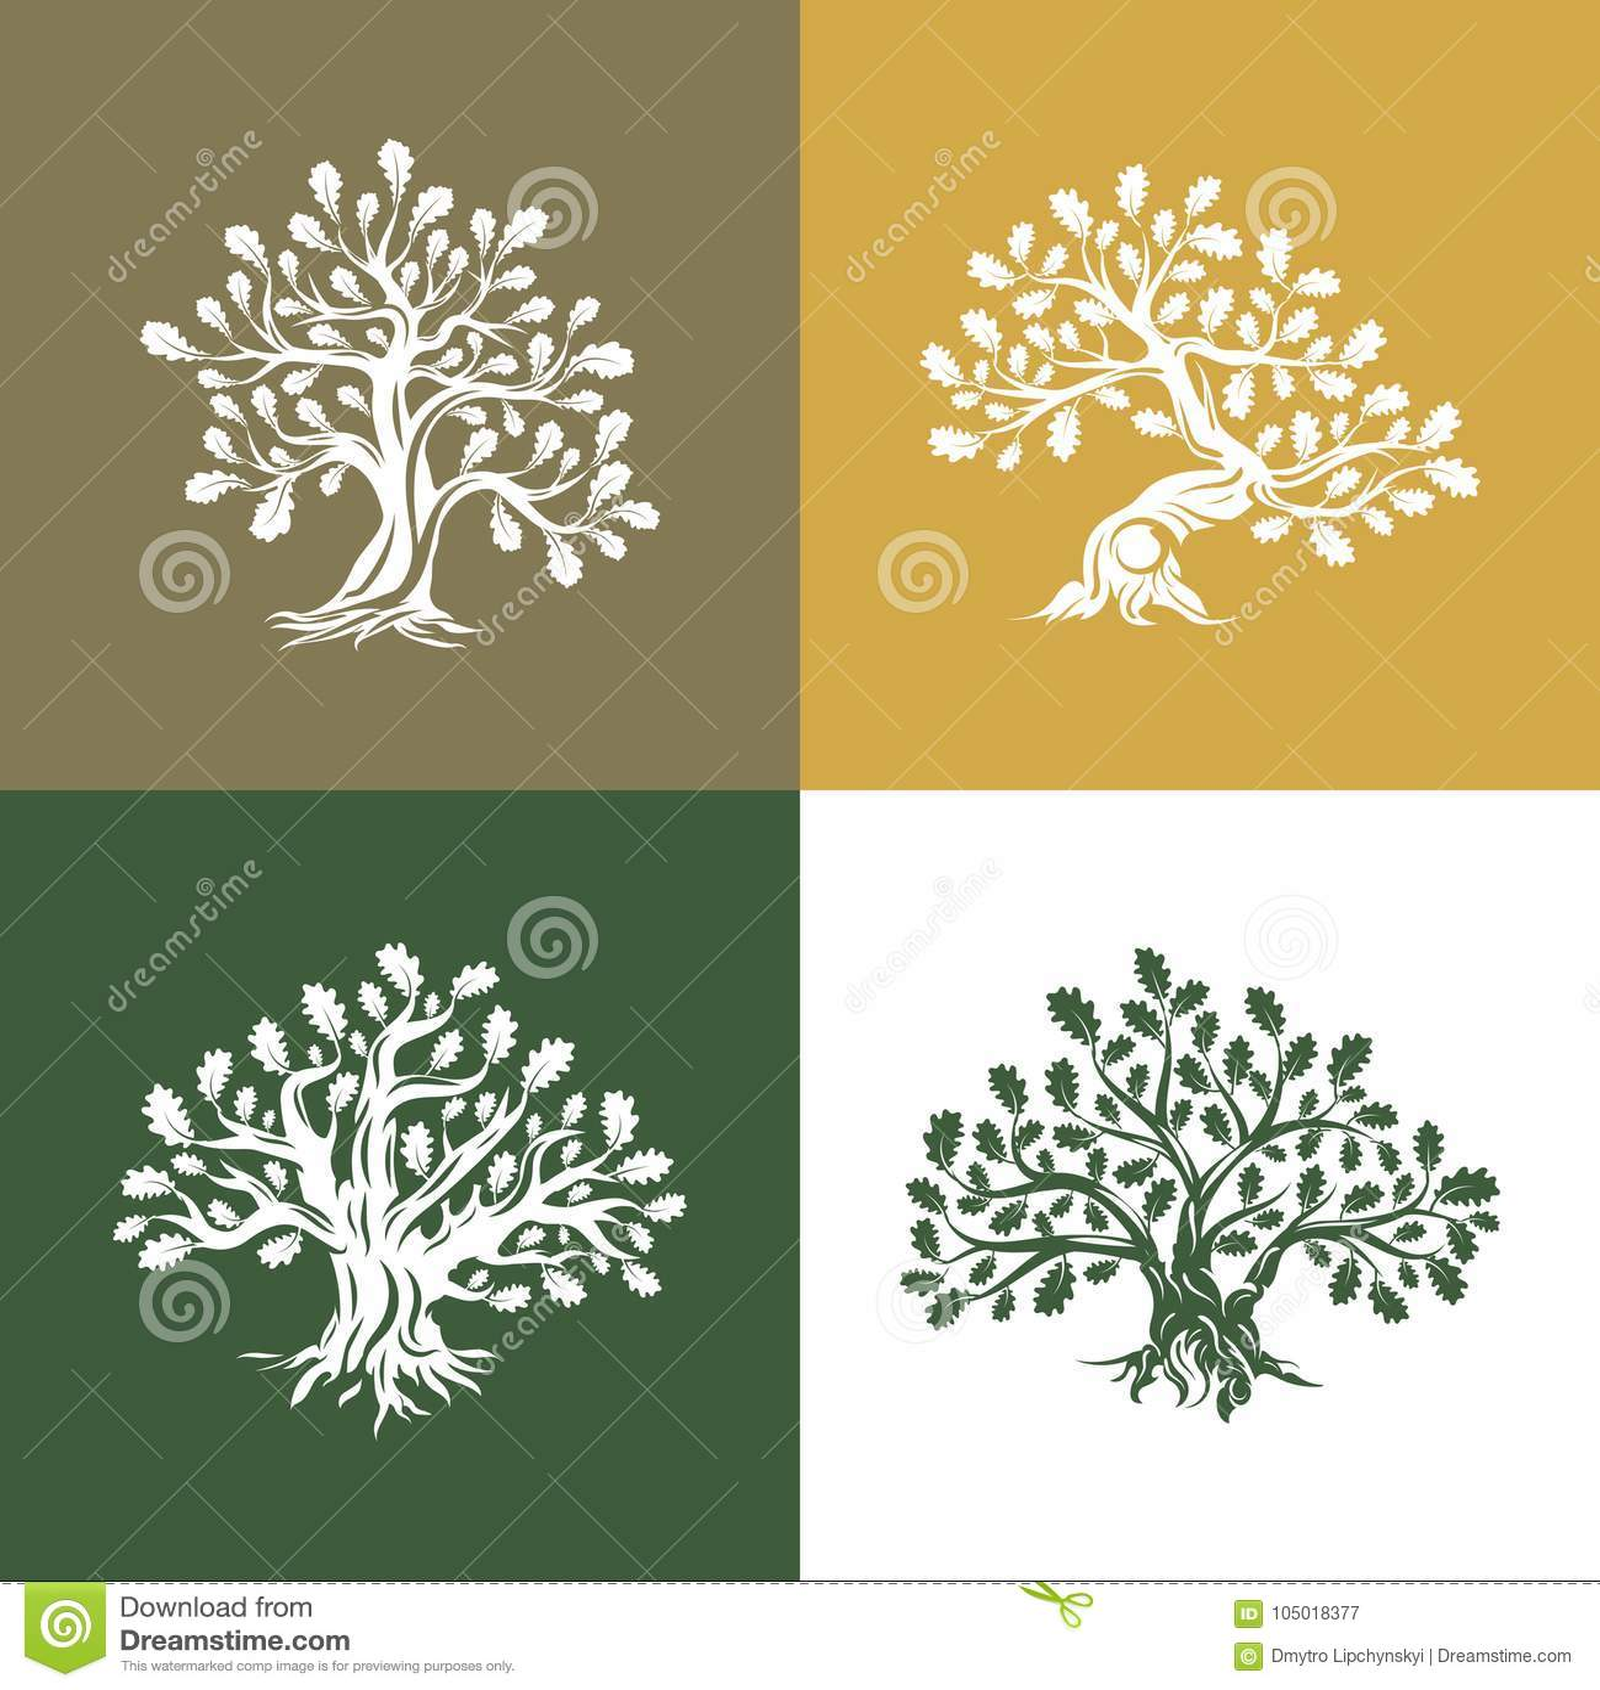 Huge and sacred oak tree silhouette logo on background